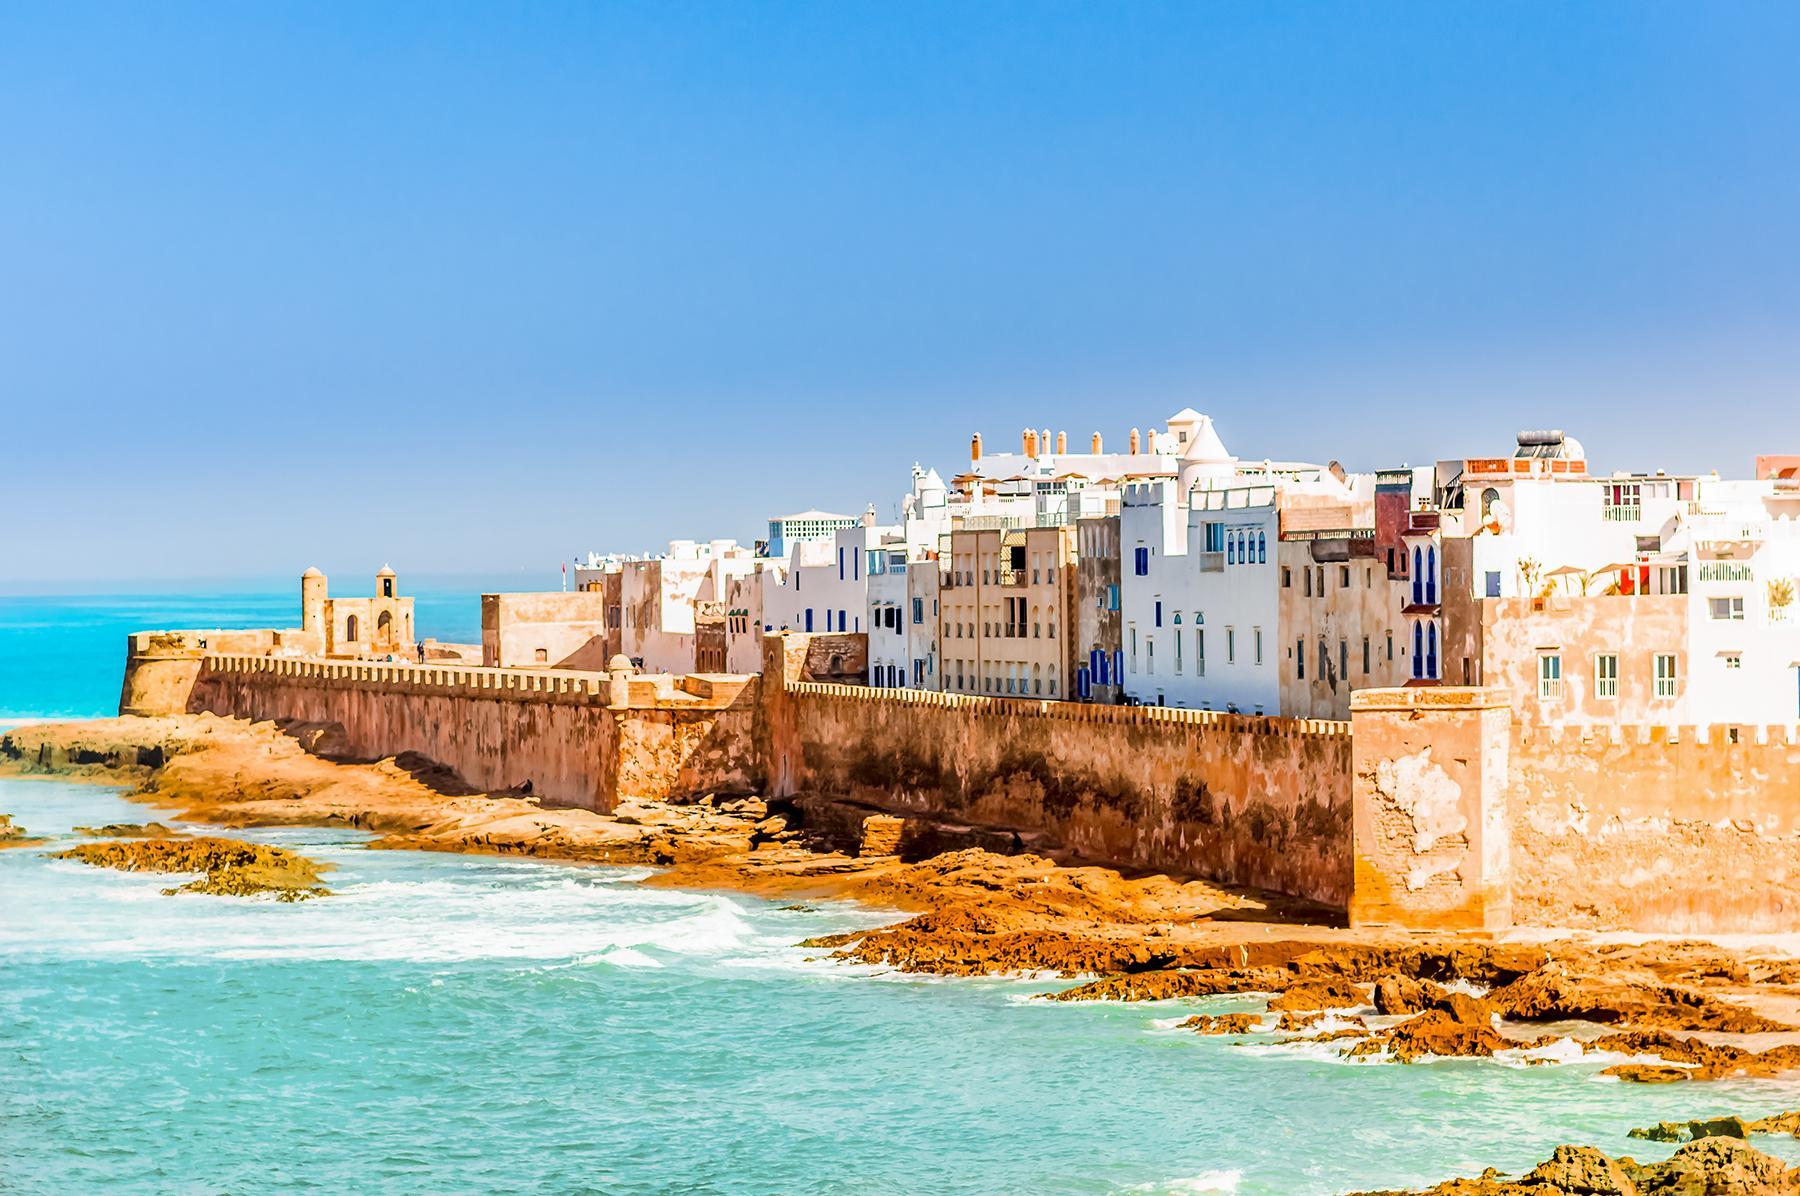 15_BeachHoneymoon__Essaouira_iStock-1040006084